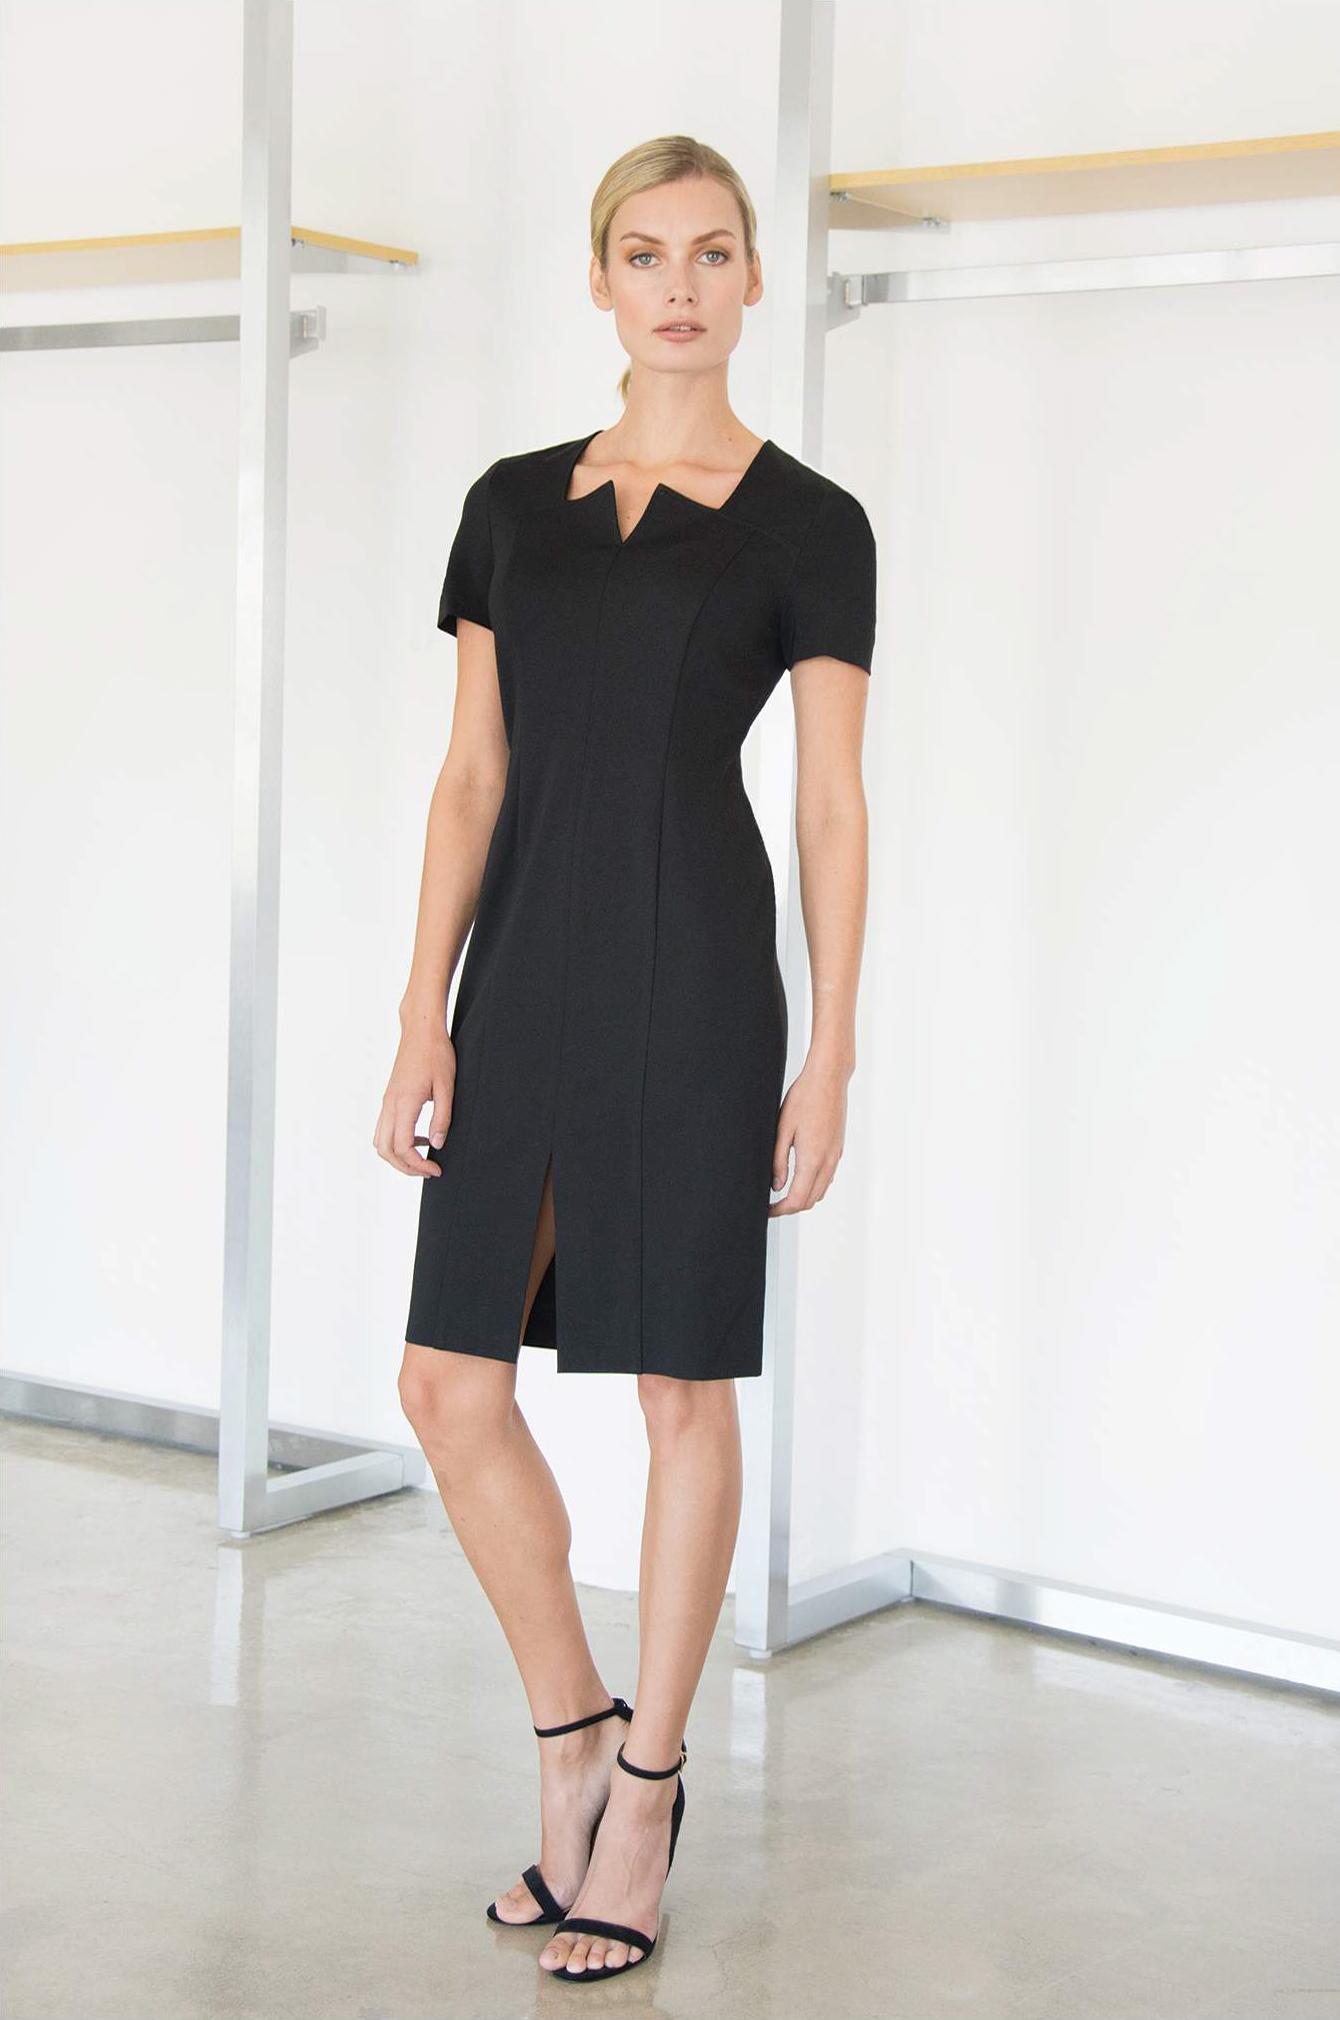 Dress: Jaime - SANTORELLI